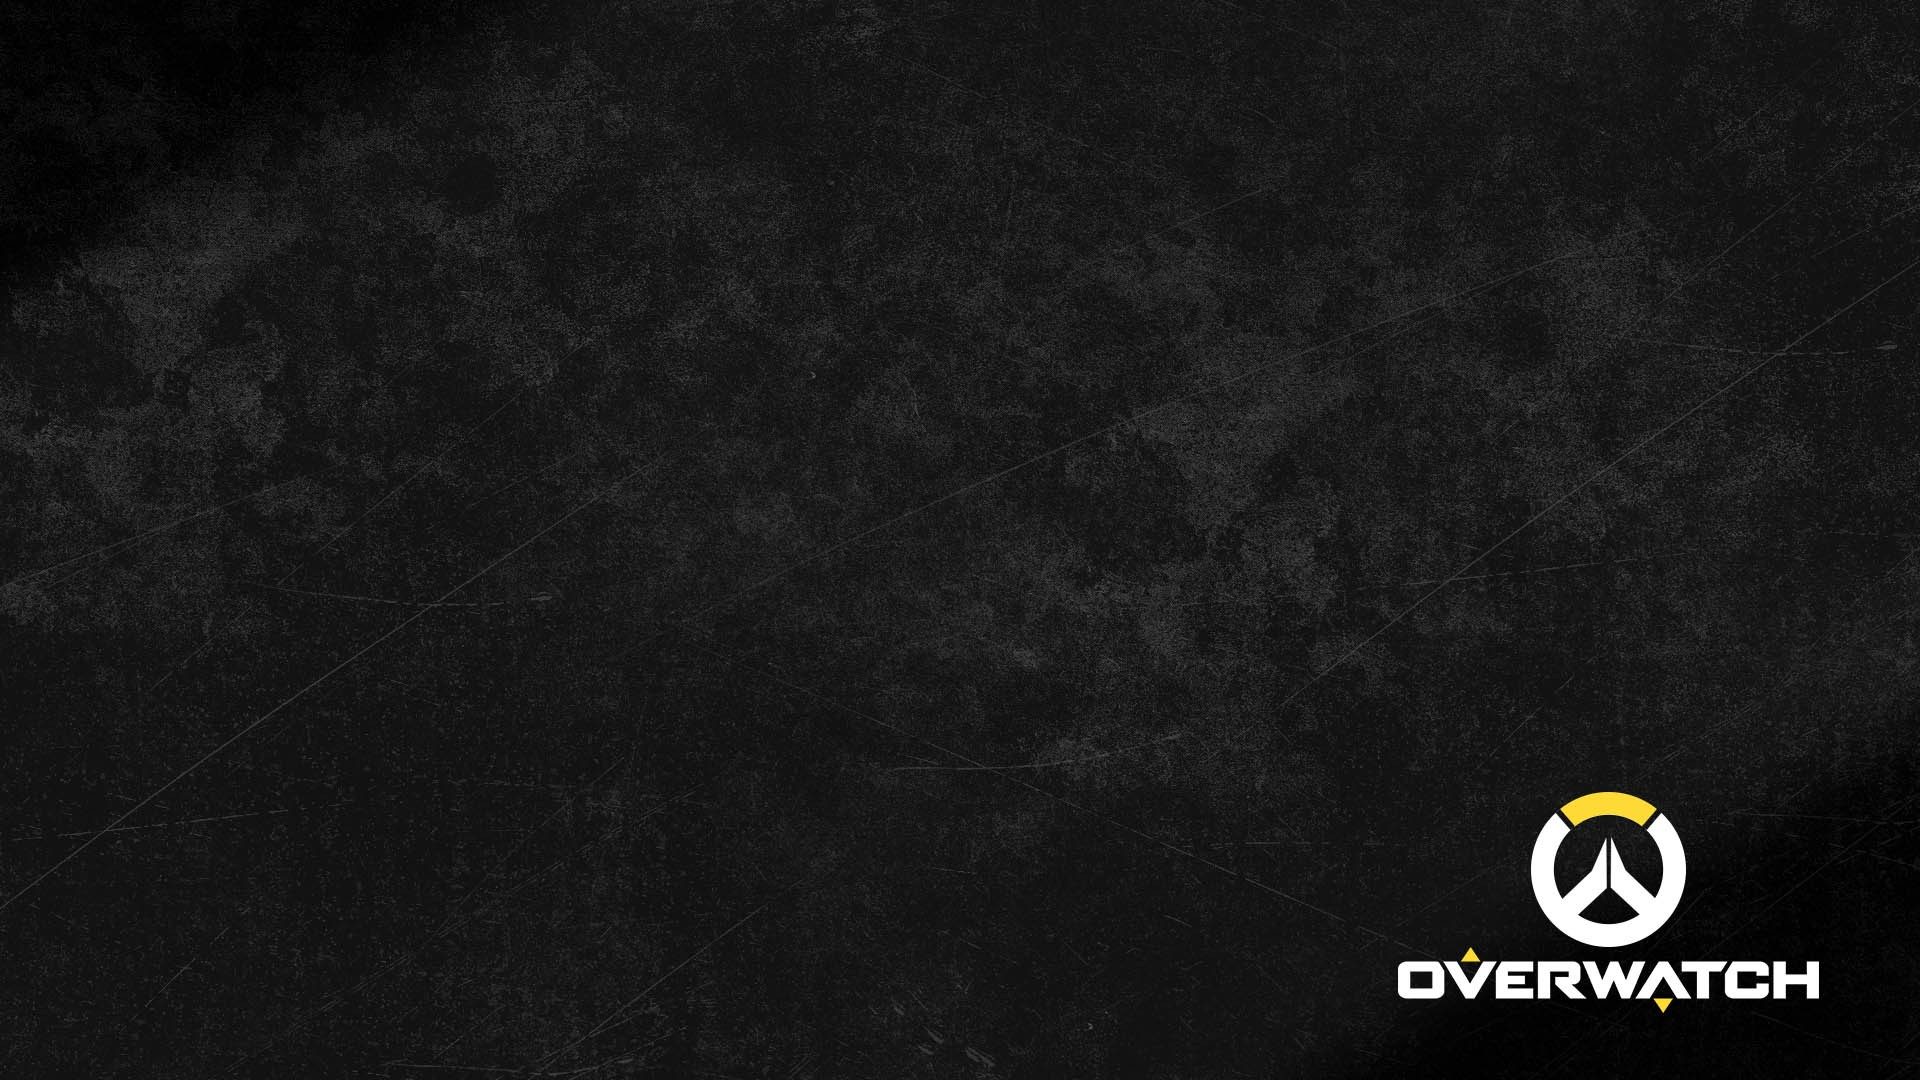 Genji Wallpaper Iphone Overwatch Logo Wallpaper 183 ① Download Free Cool Hd